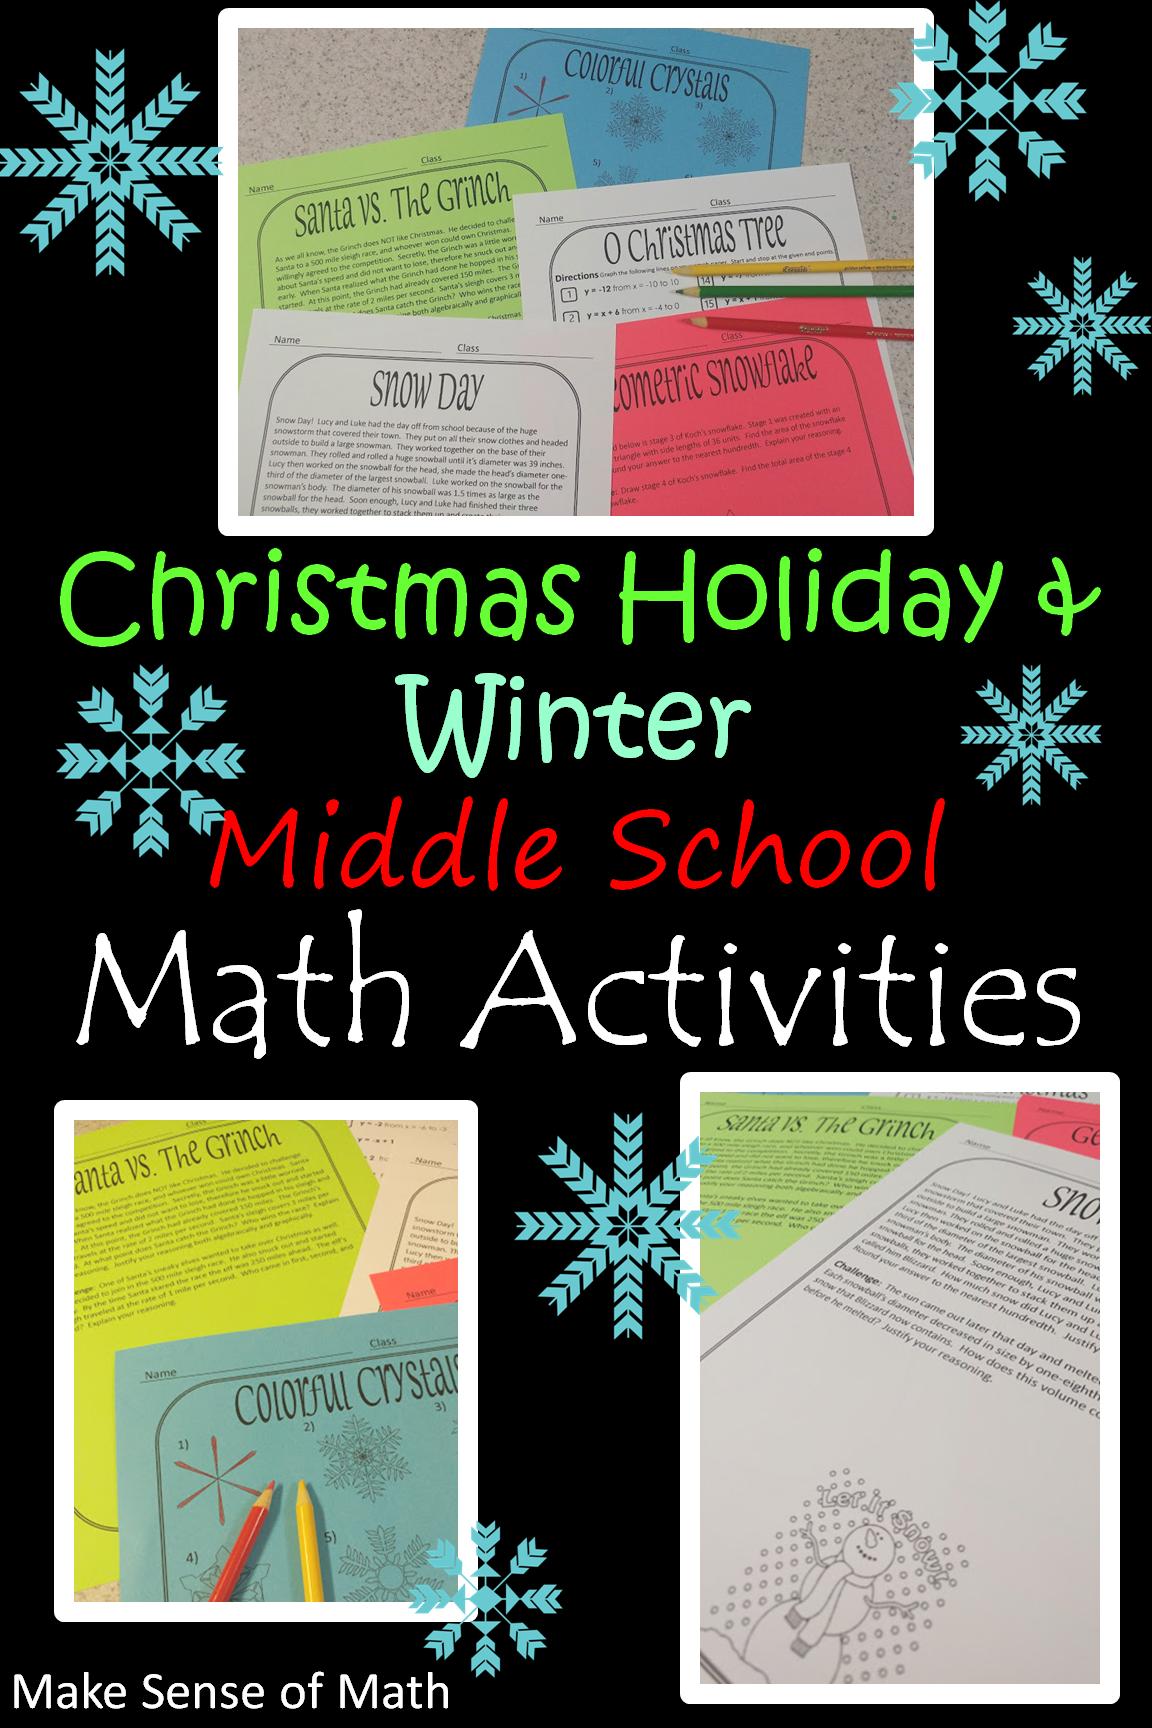 Christmas Math Activities Middle School